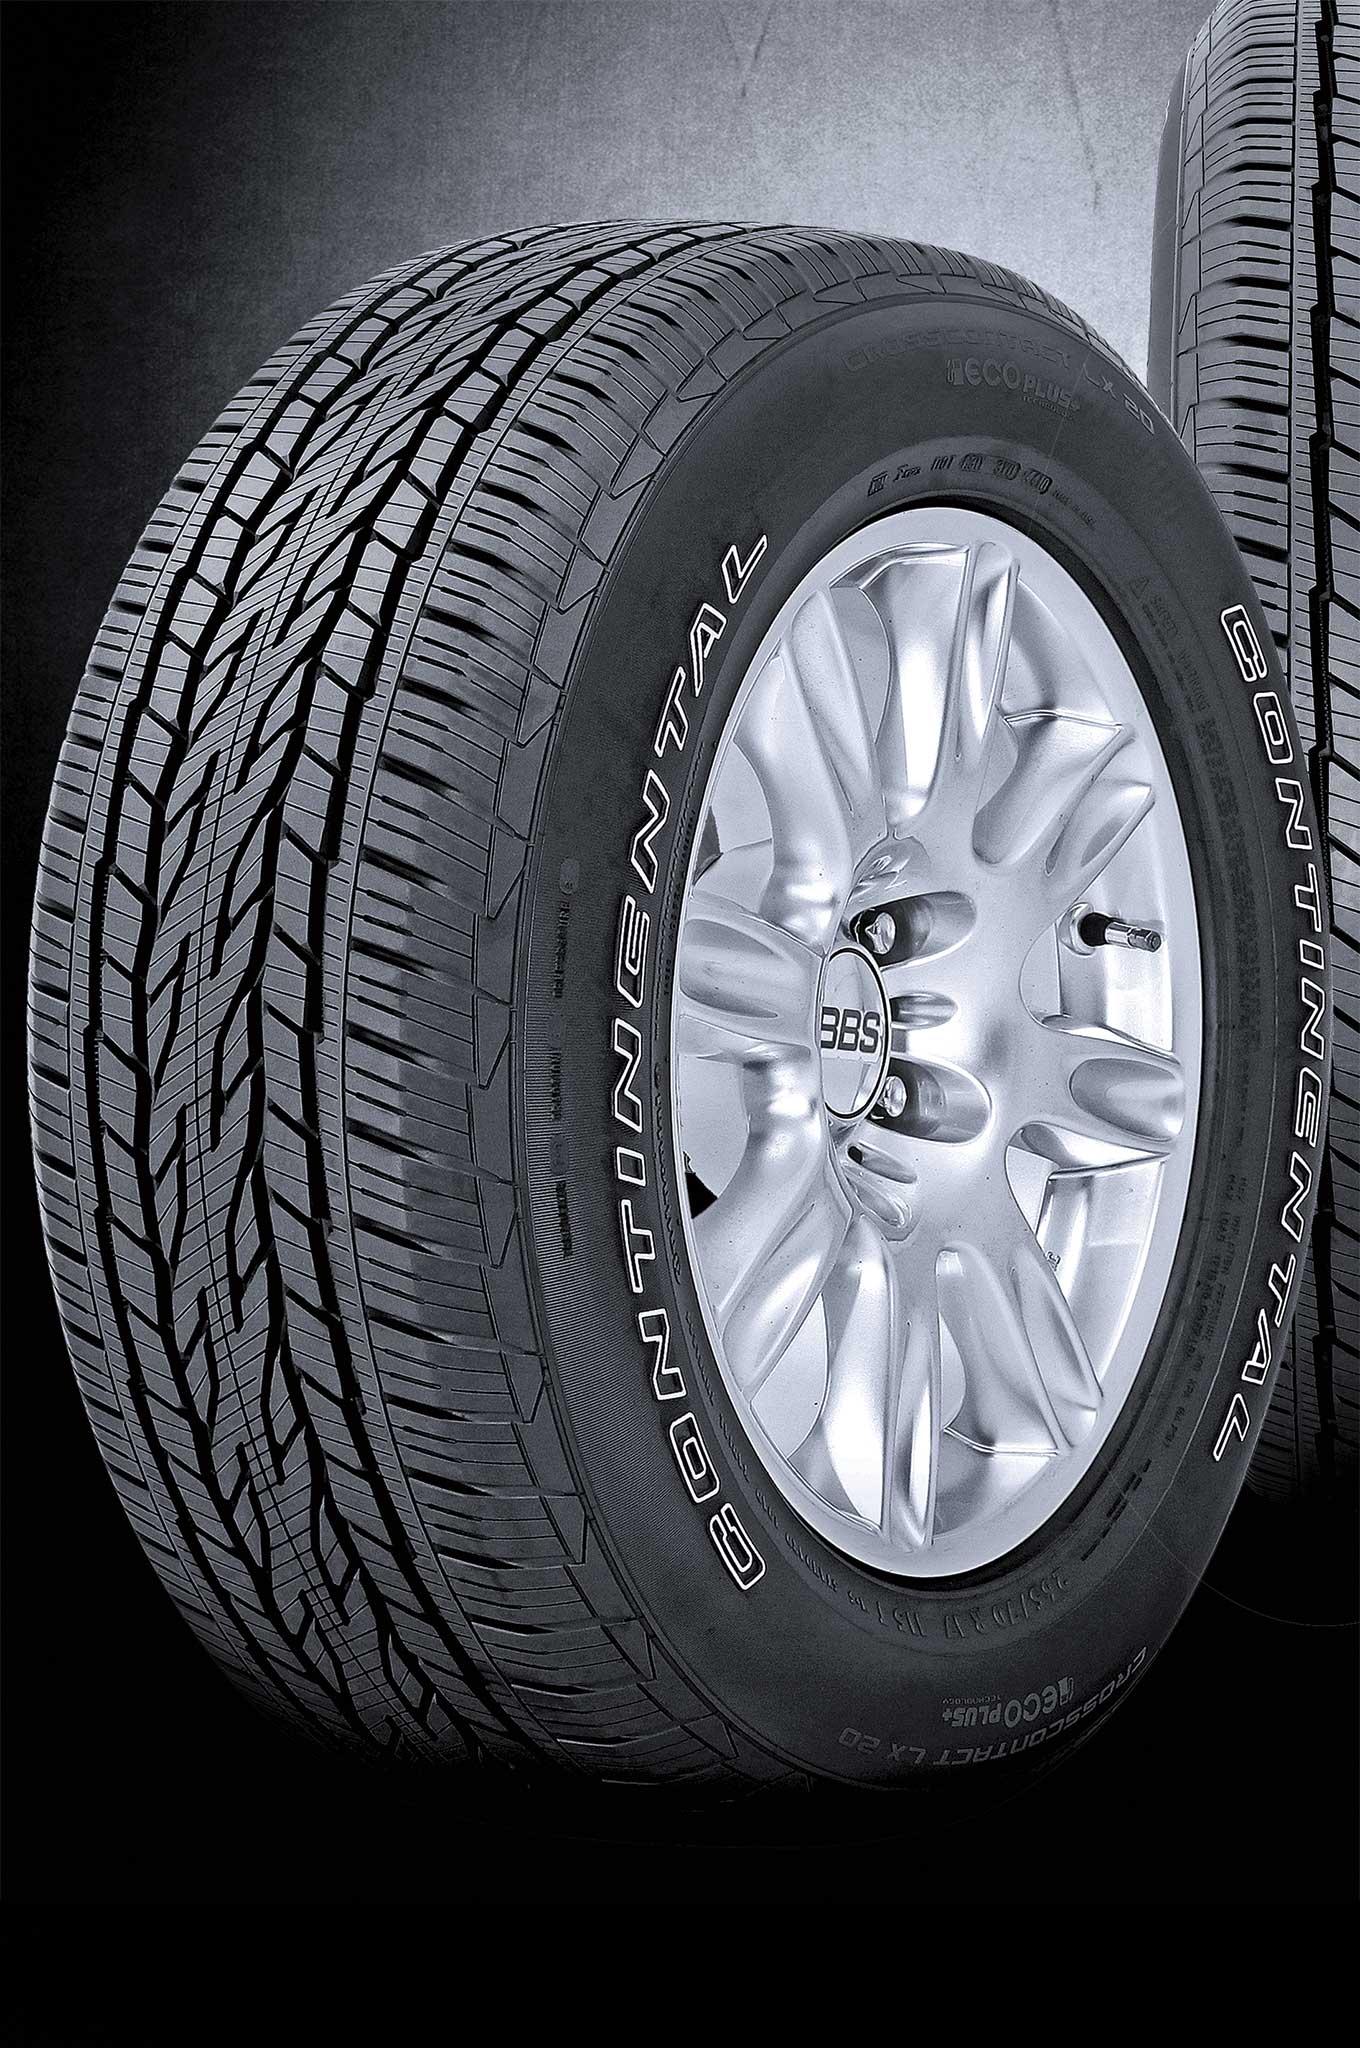 continental tires premium passenger tires crosscontact lx20 005